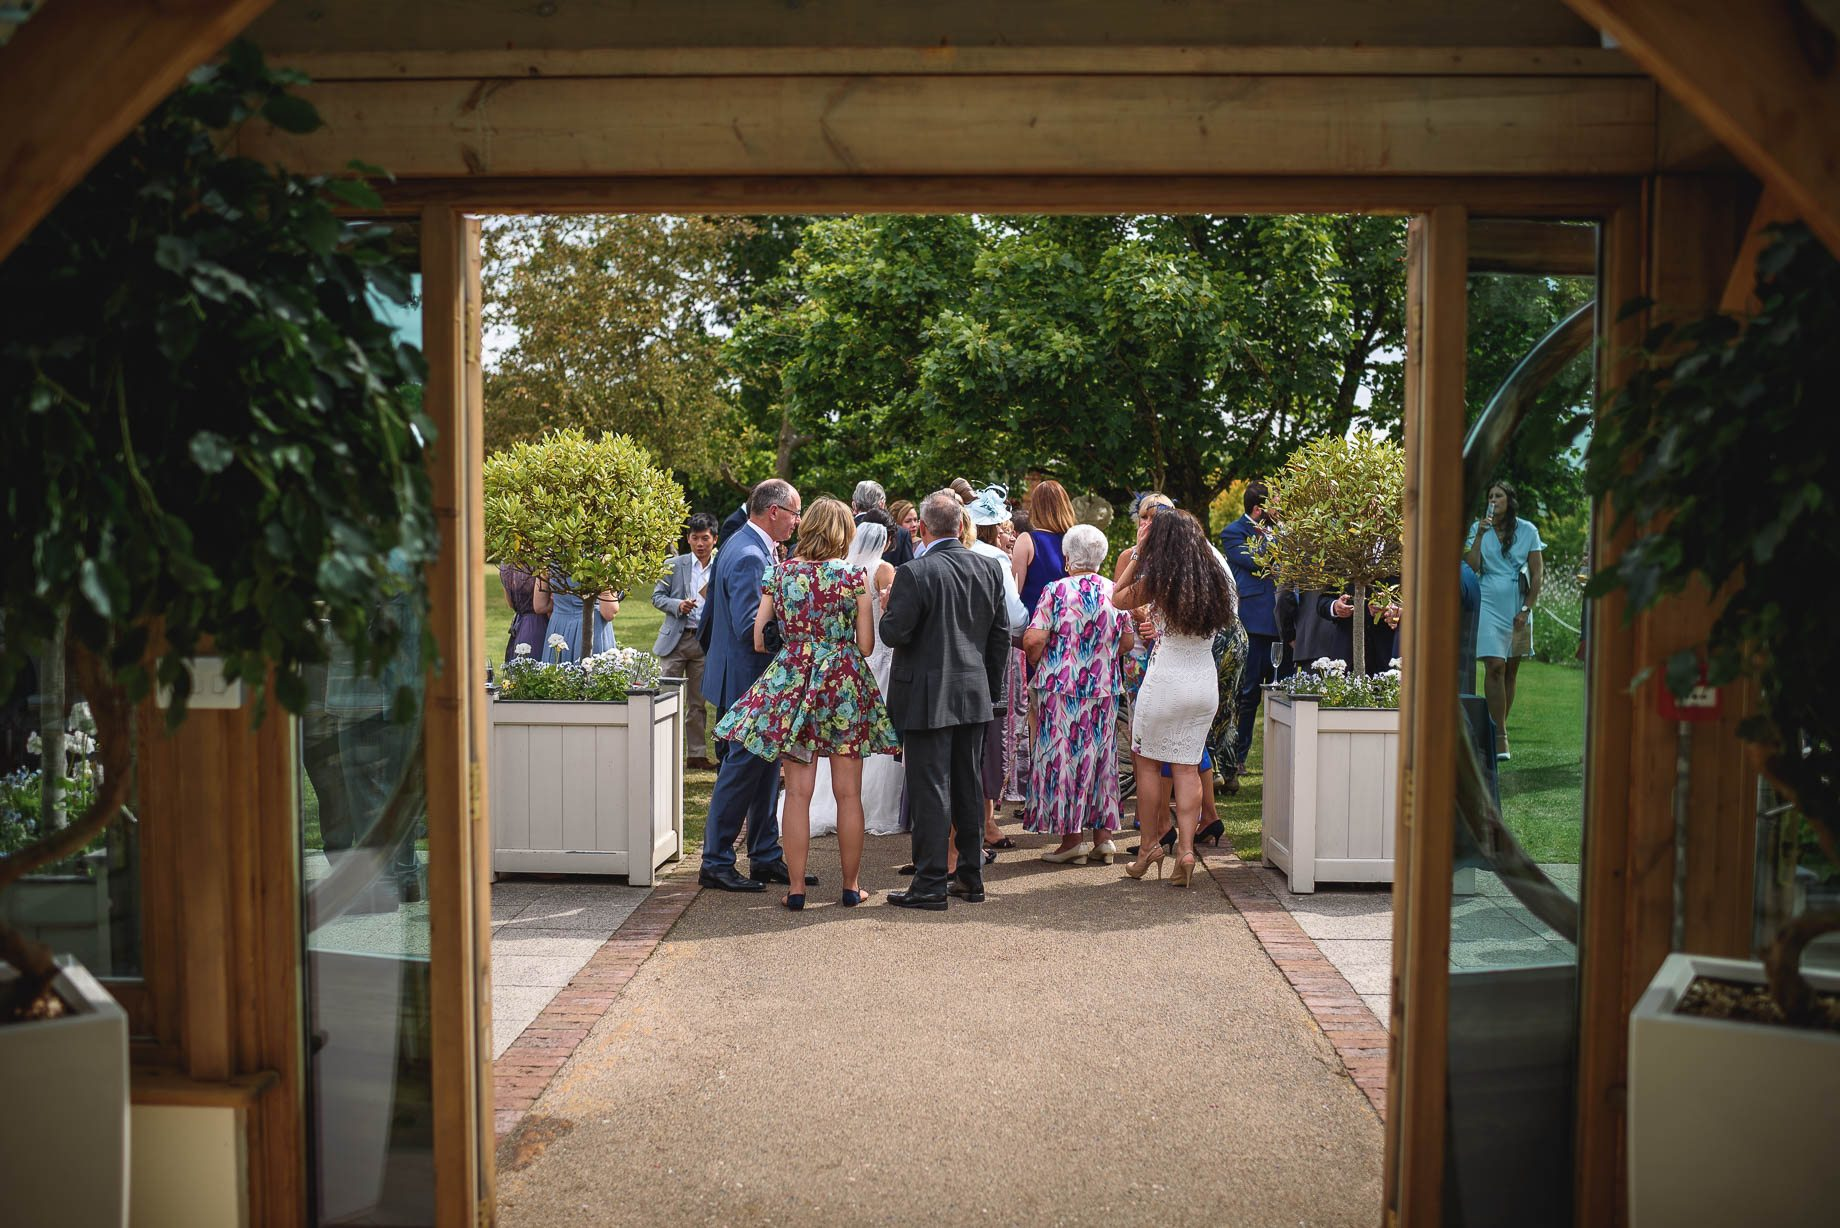 Gaynes Park wedding photography - Guy Collier Photography - Rachel and Jon (90 of 169)